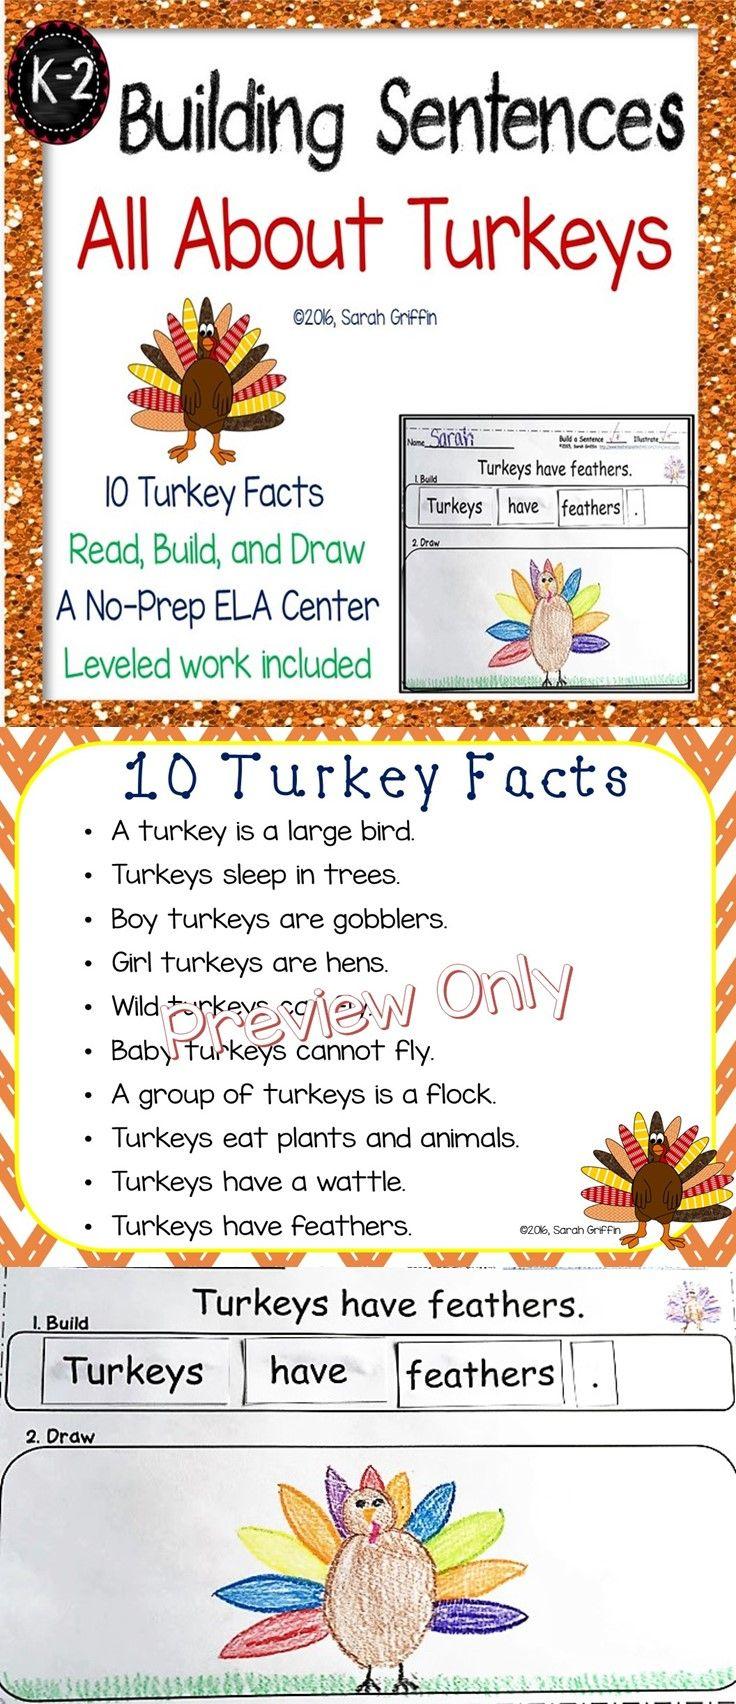 Building Sentences | Turkey facts for kids | Printables | Thanksgiving | Centers | Word Word | Leveled work | No-prep | Writing | Kindergarten | 1st grade | 2nd grade